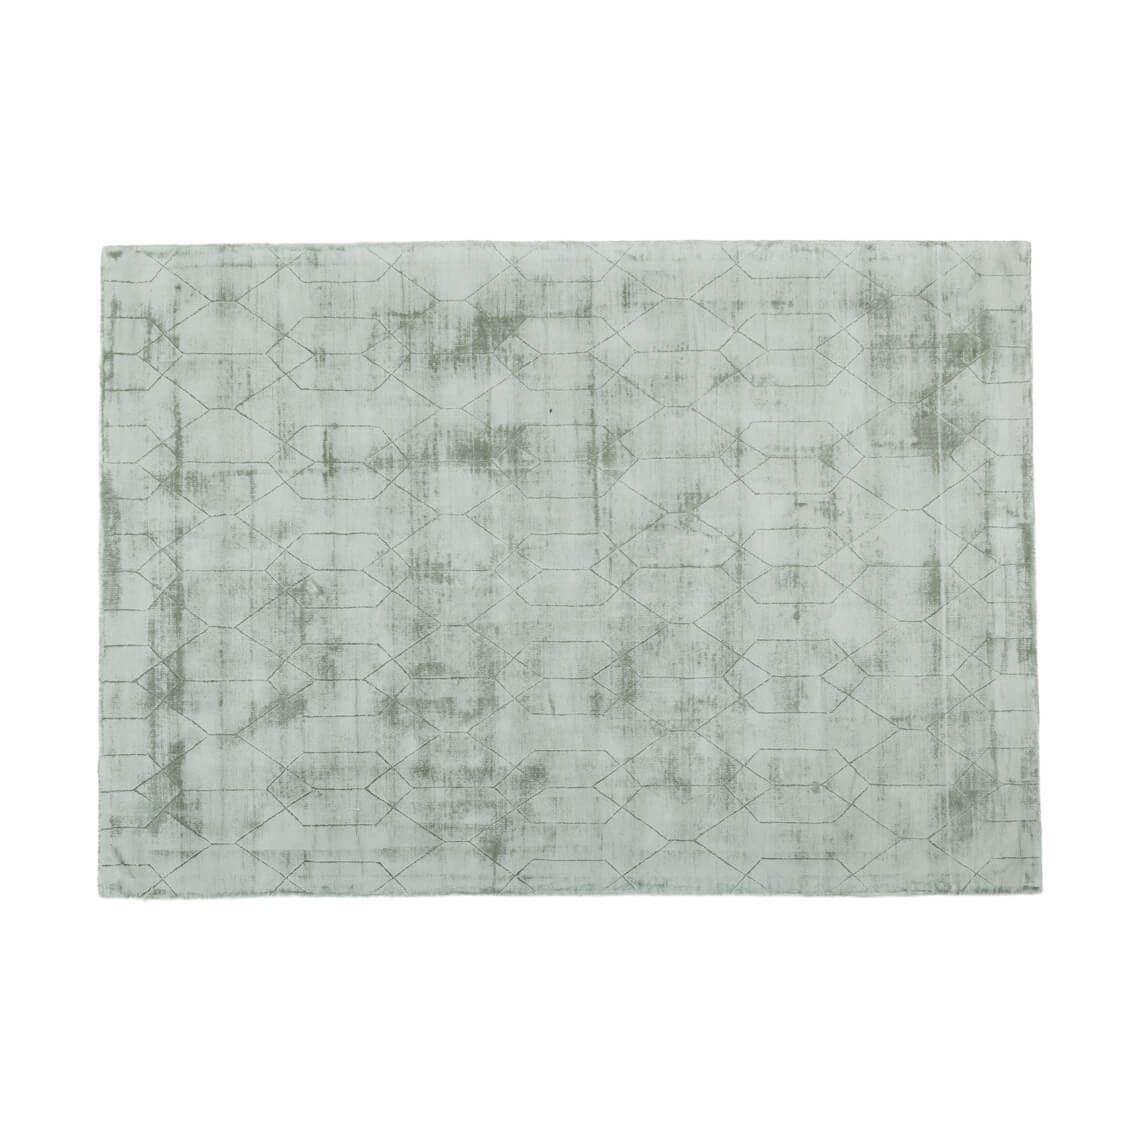 Aiko Floor Rug Size W 160cm x D 230cm x H 1cm in Moss Freedom